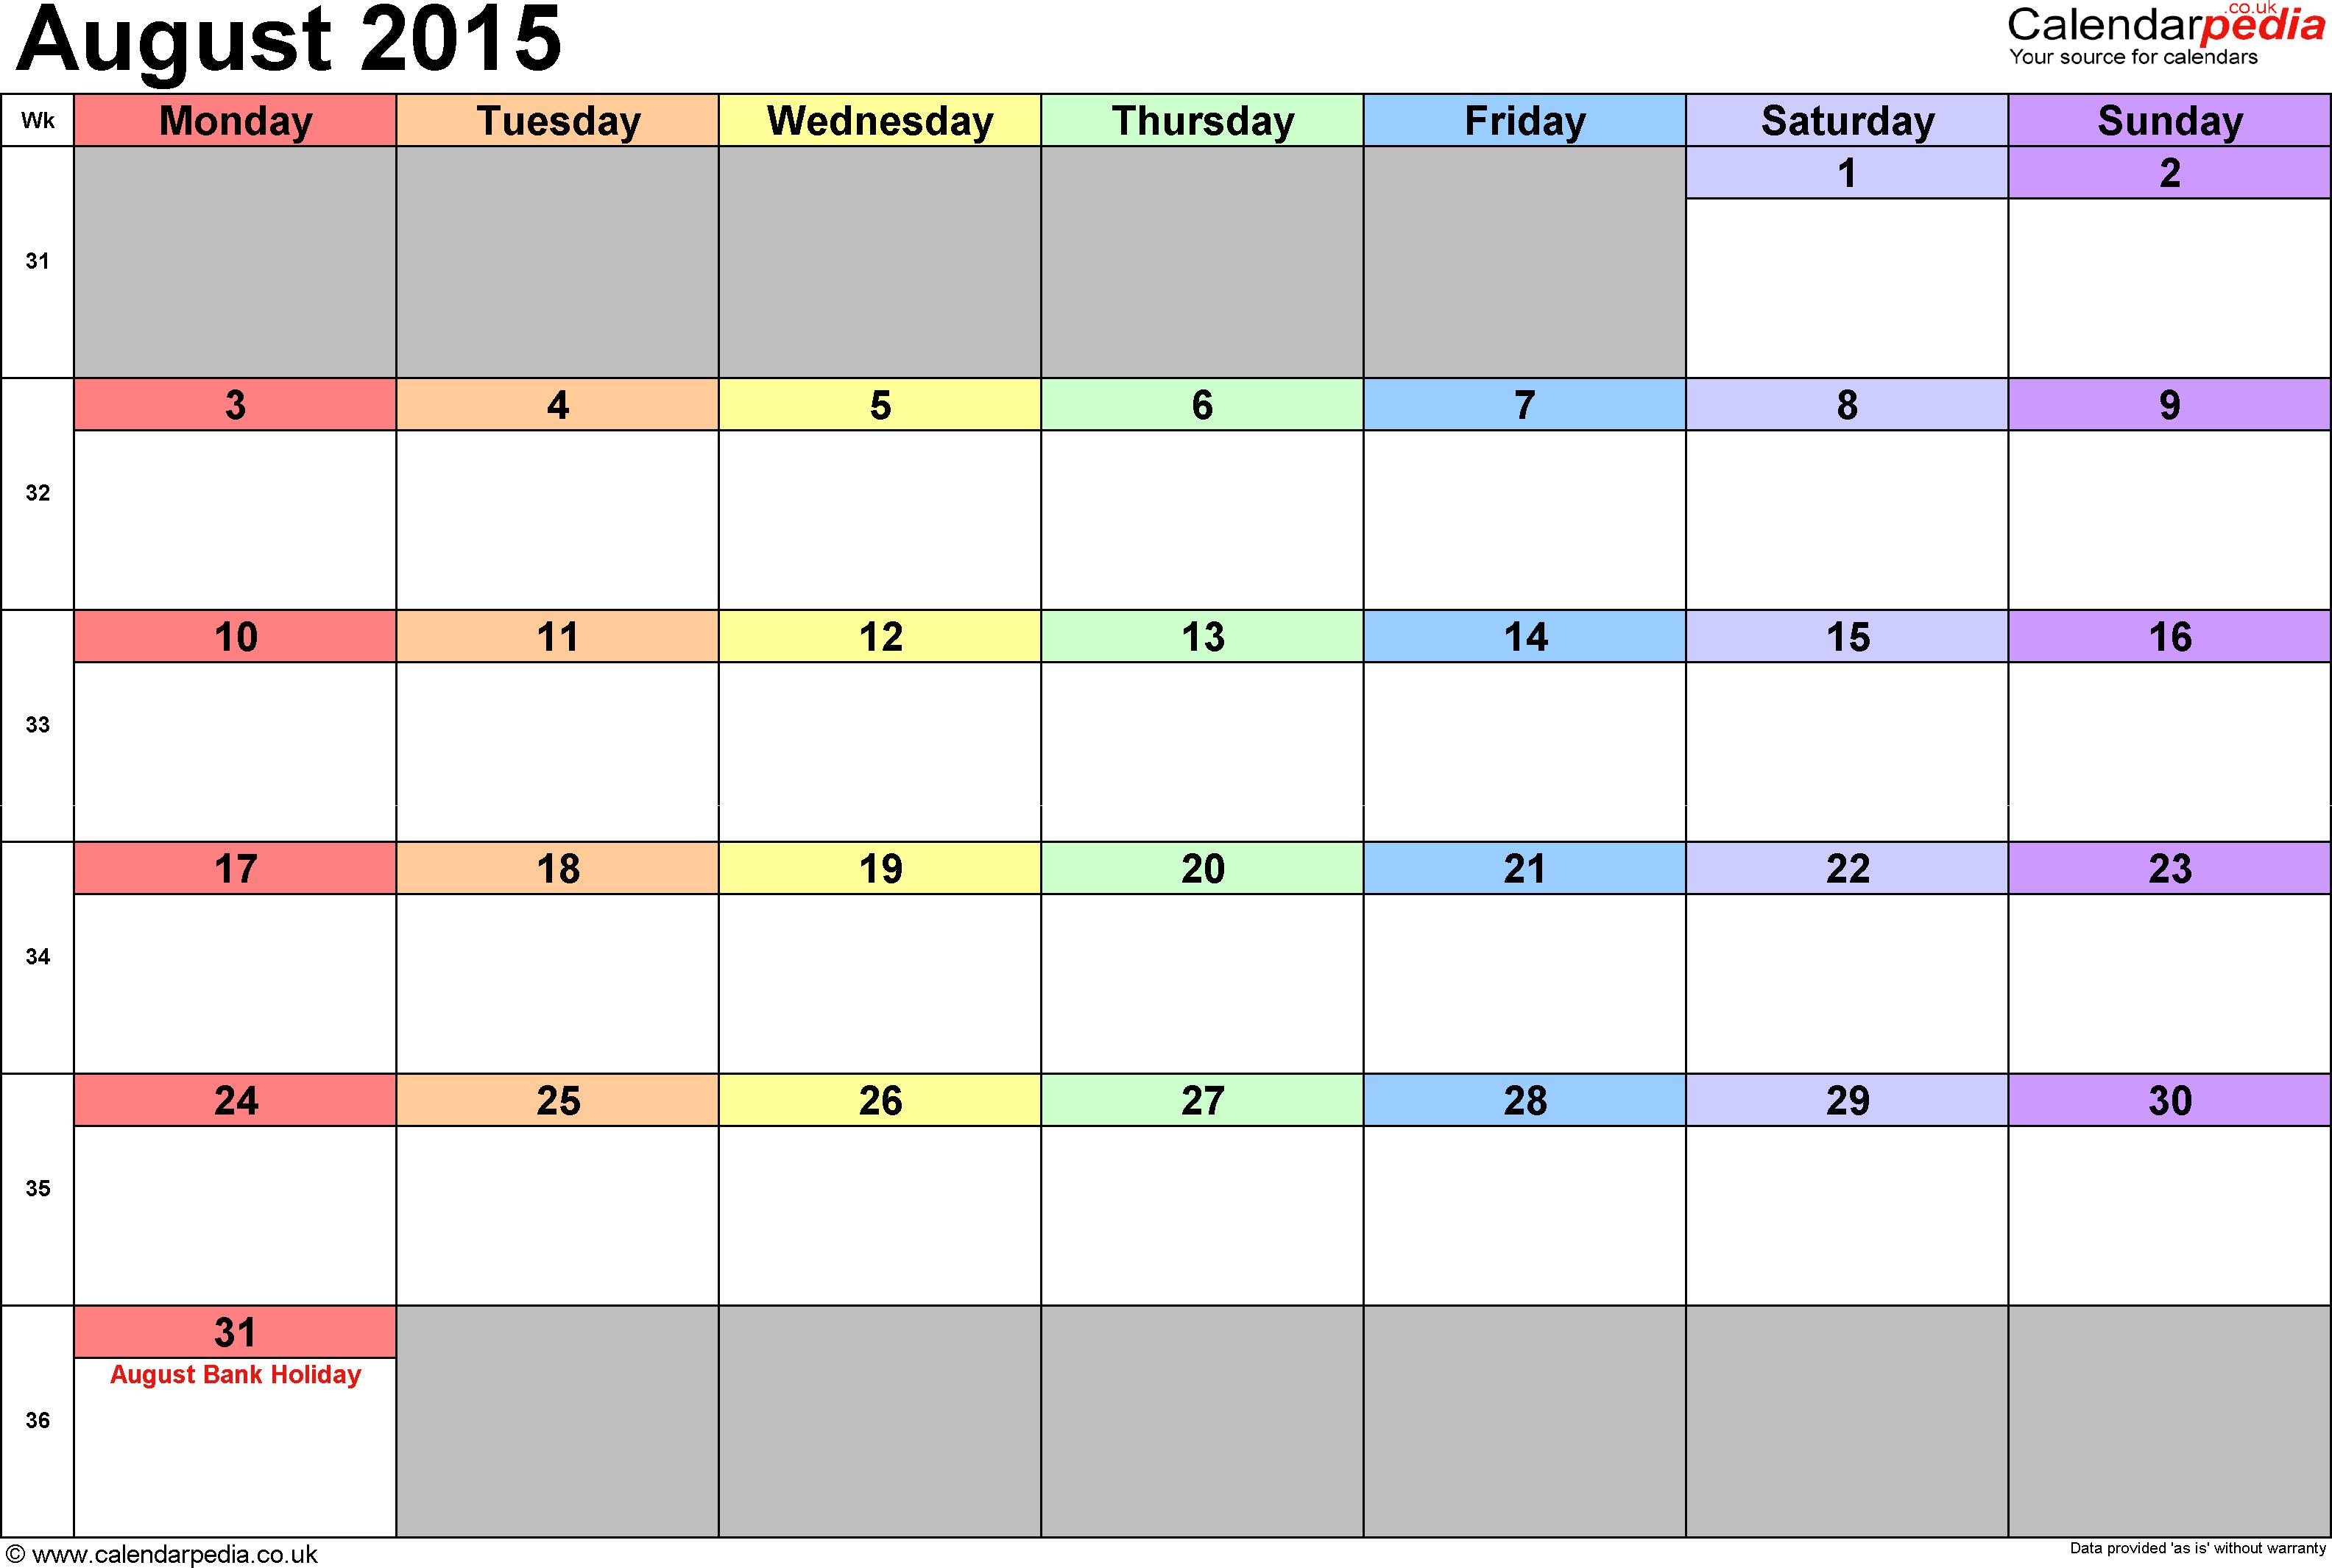 August 2015 Calendar Hd Wallpapers Download Free August 2015